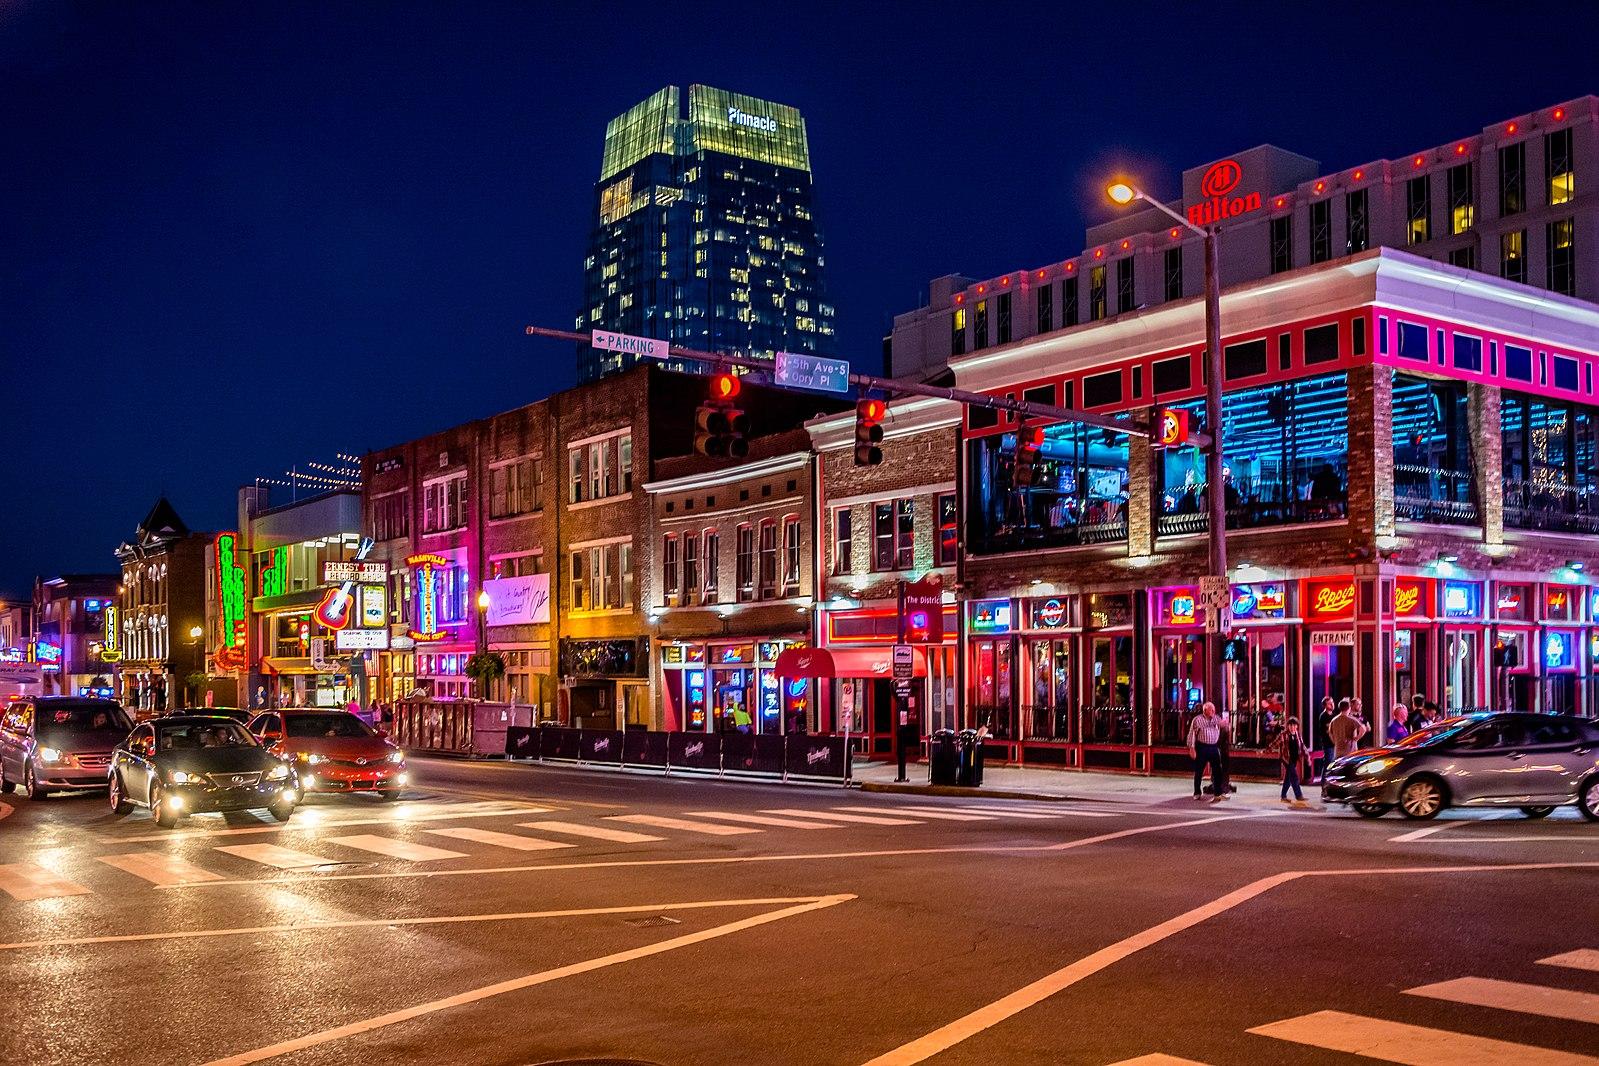 "https://www.youredm.com/ ""srcset ="" https://www.youredm.com/wp-content/uploads/2020/05/1599px-Broadway_Nashville_lights.jpg 1599w, https://www.youredm.com /wp-content/uploads/2020/05/1599px-Broadway_Nashville_lights-1024x683.jpg 1024w, https://www.youredm.com/wp-content/uploads/2020/05/1599px-Broadway_Nashville_lights-768x512.jpg 768w, https : //www.youredm.com/wp-content/uploads/2020/05/1599px-Broadway_Nashville_lights-1536x1024.jpg 1536w, https://www.youredm.com/wp-content/uploads/2020/05/1599px- Broadway_Nashville_lights-360x240.jpg 360w ""tailles ="" (largeur max: 1599px) 100vw, 1599px ""/></div> </div> <section class="